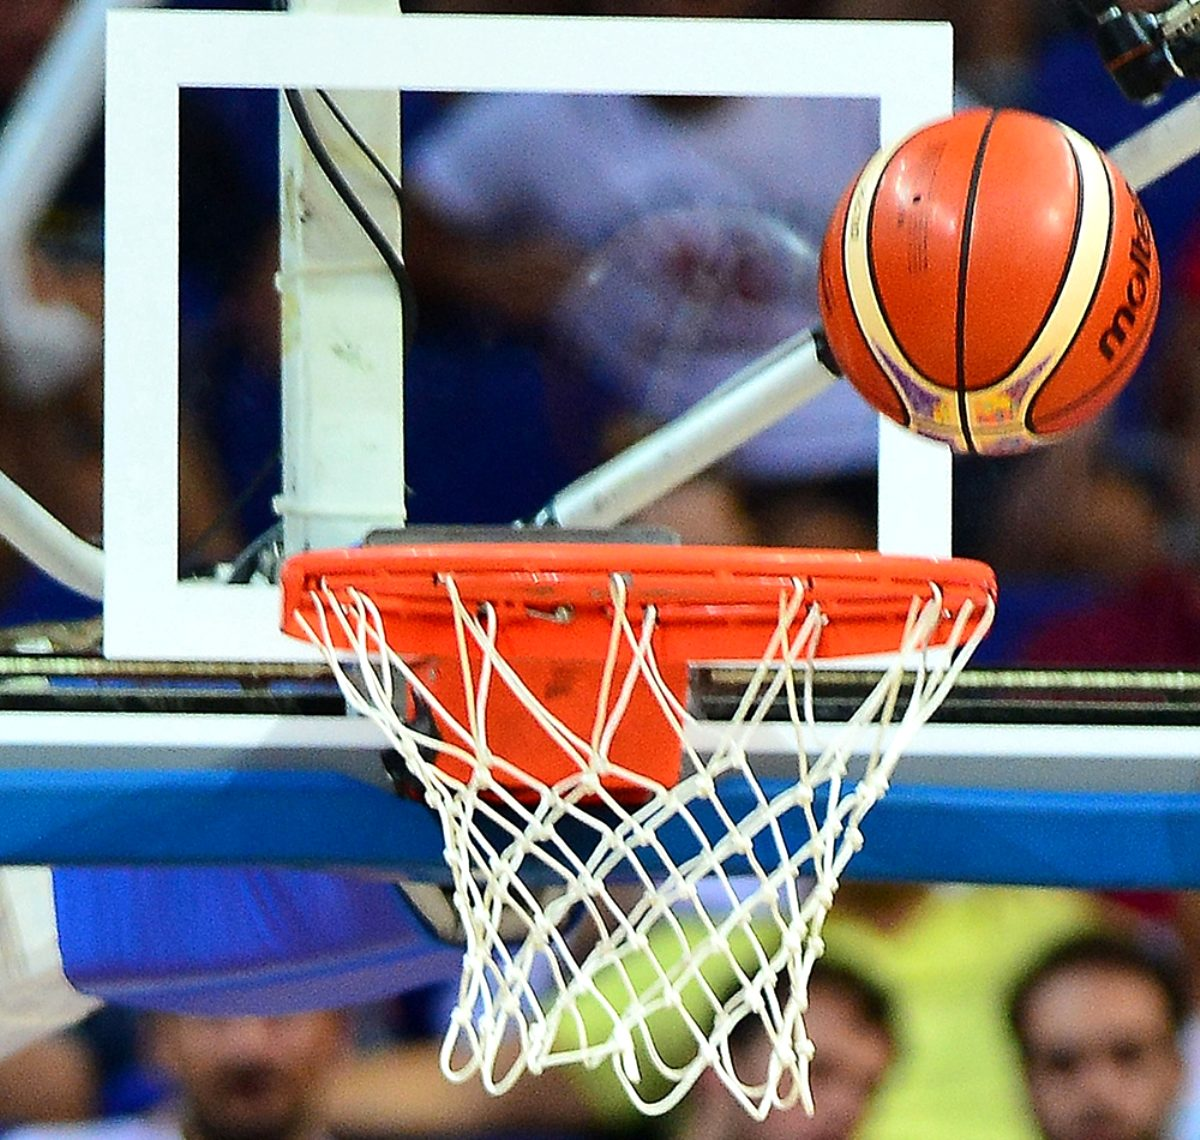 ING Basketbol Süper Ligi'nde 12. hafta heyecanı